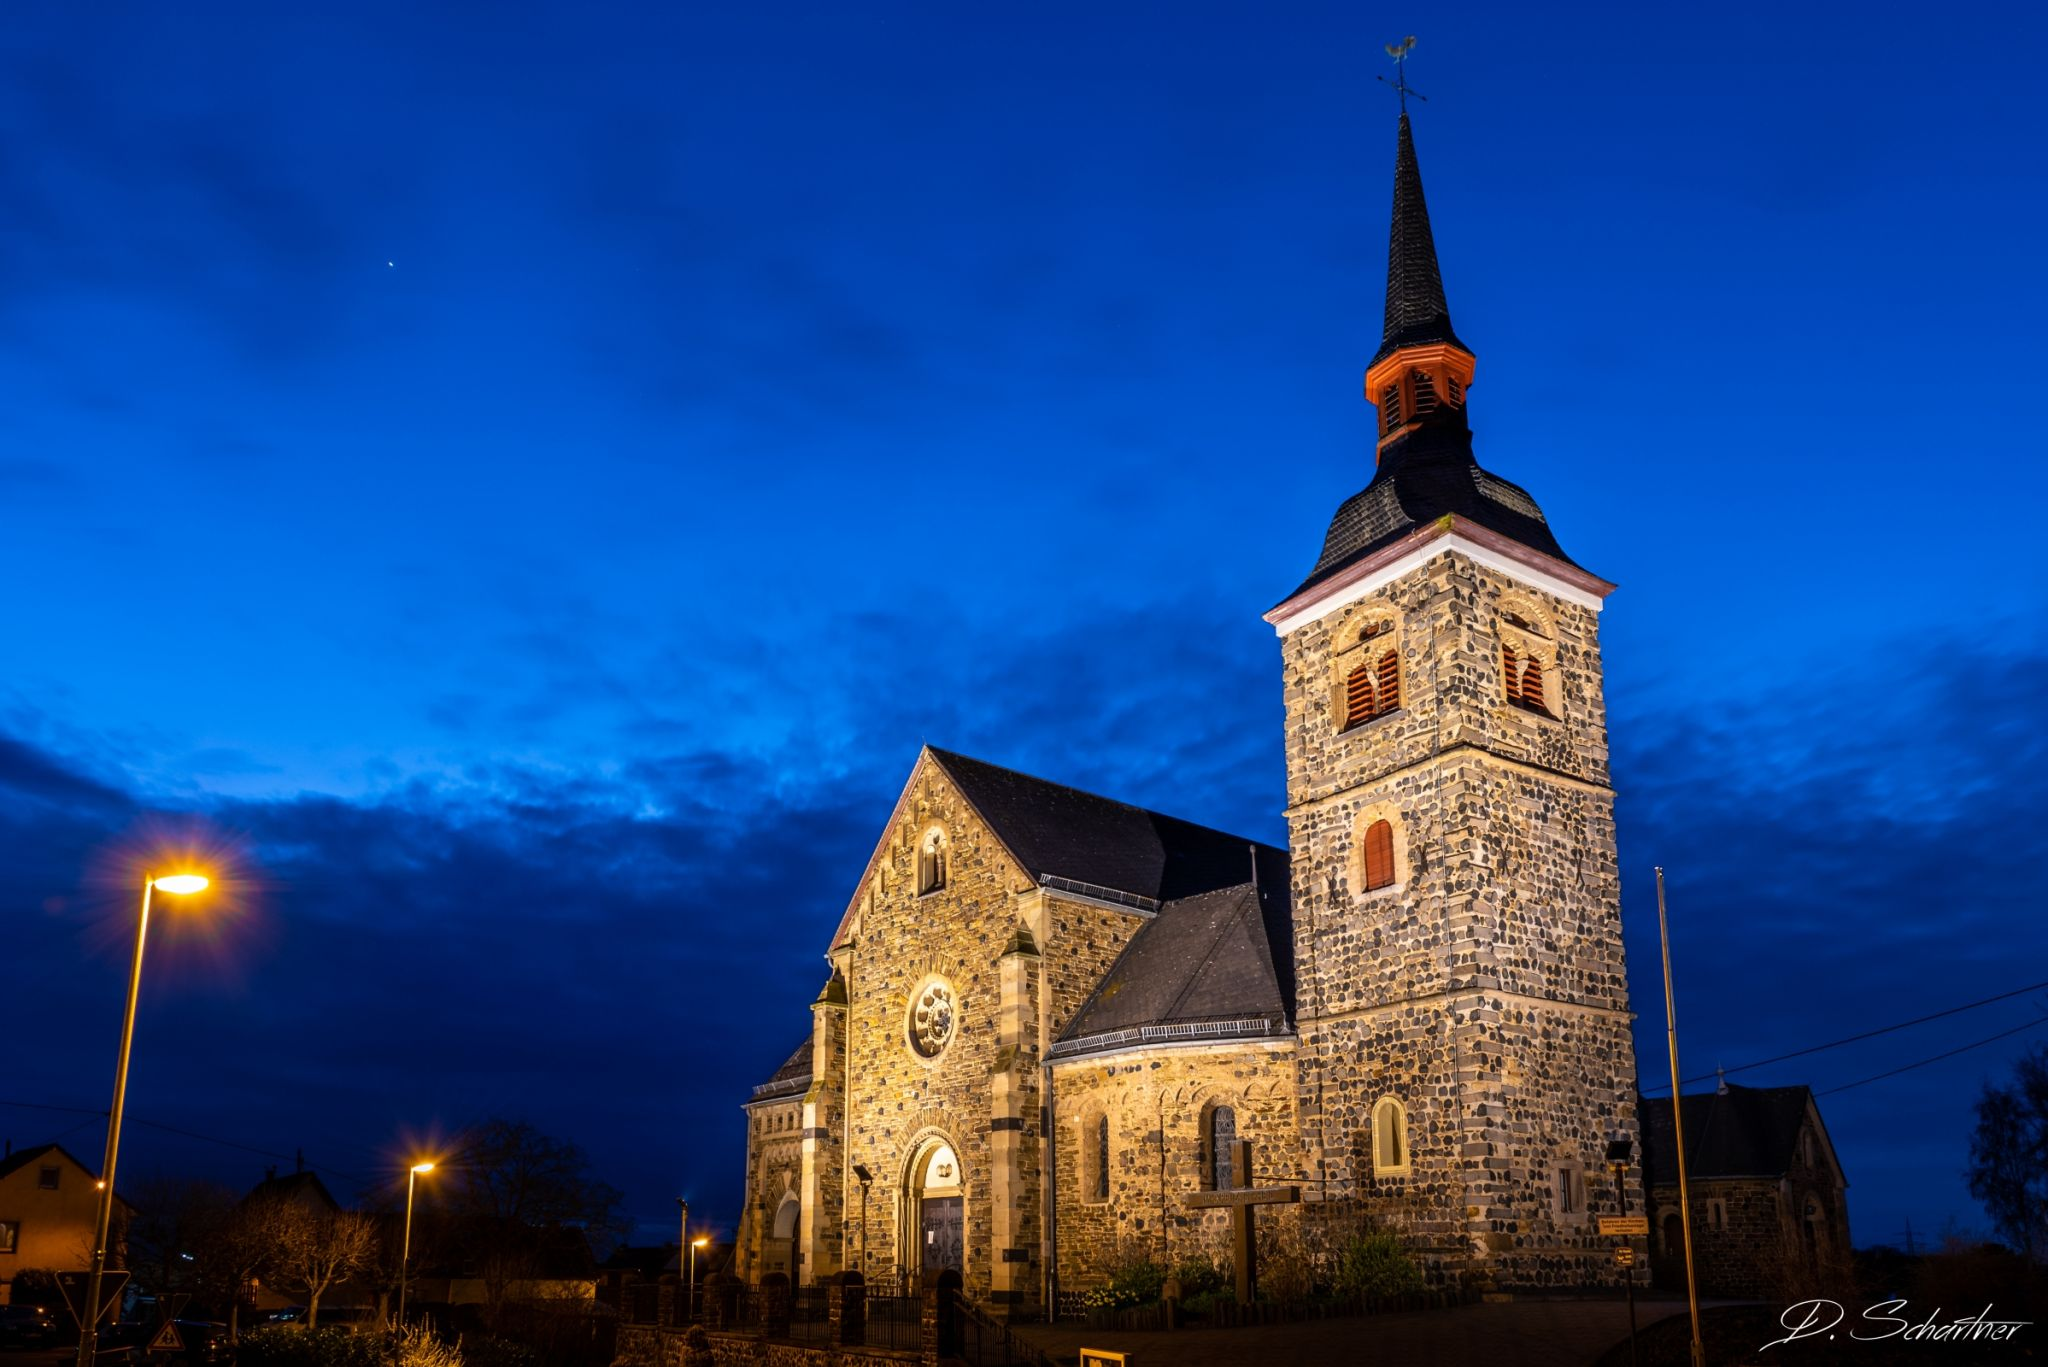 Pfarrkirche St. Nikolaus, Germany